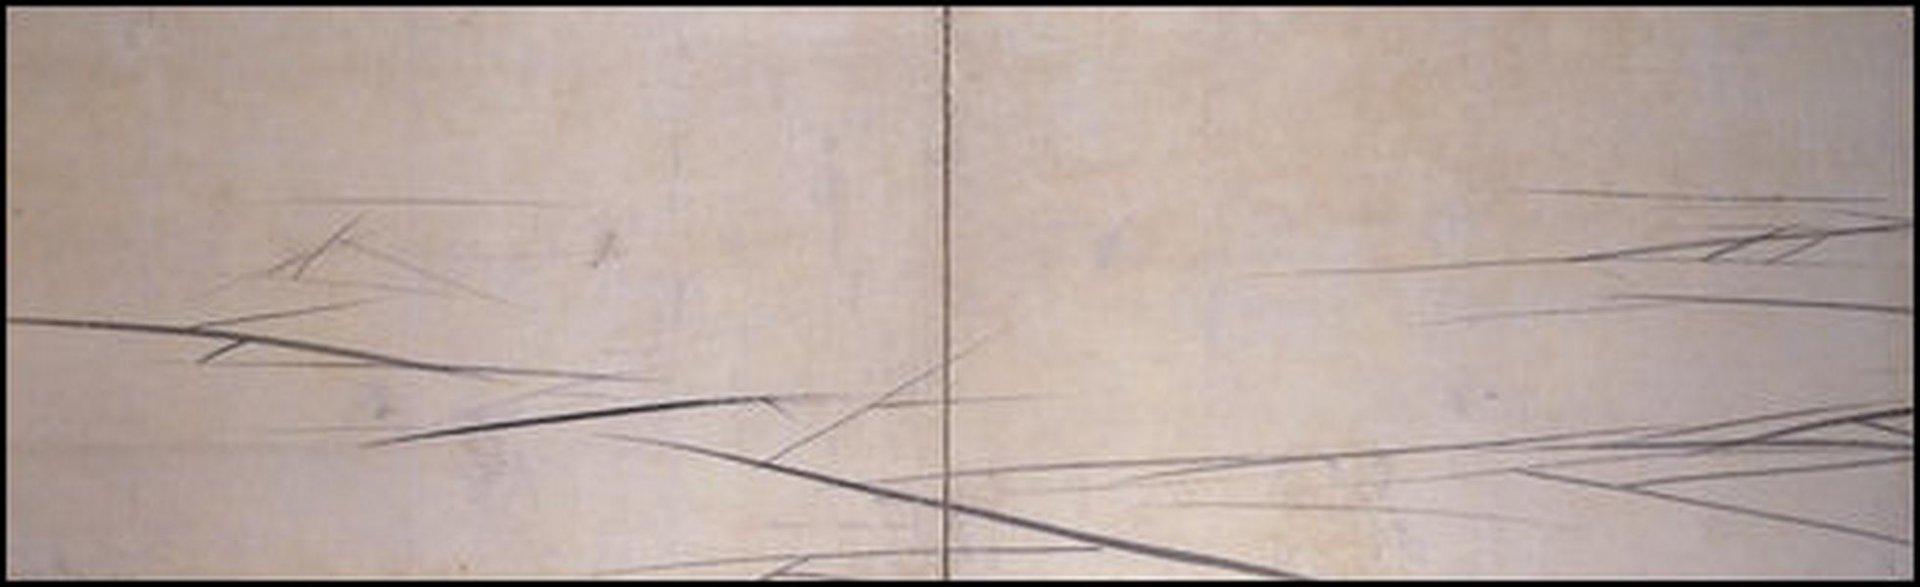 20091026-British Maruyam Okyo треснувший лёд.jpg